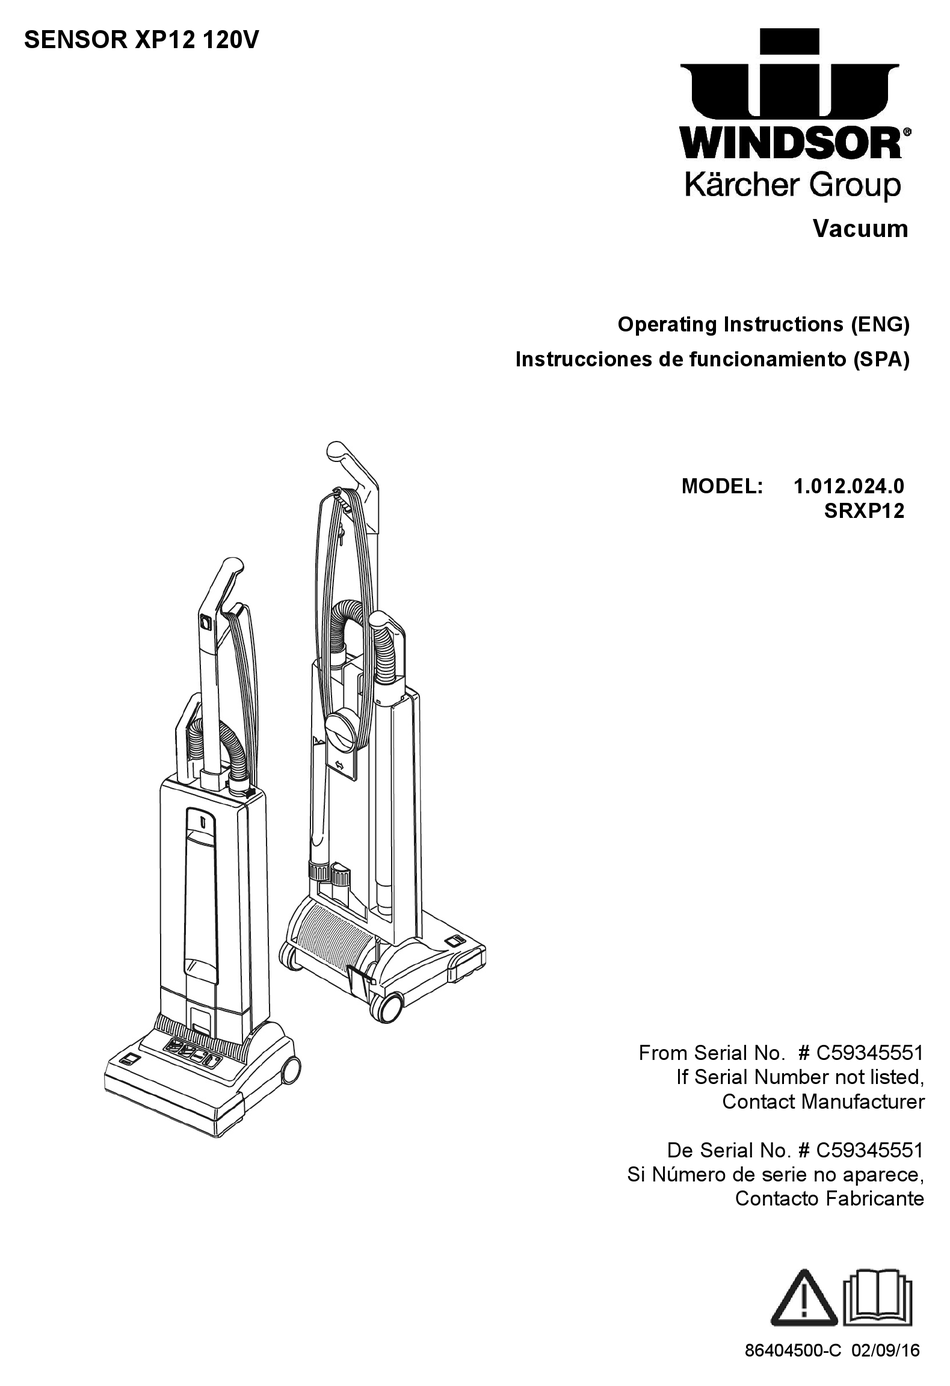 WINDSOR SENSOR XP12 OPERATING INSTRUCTIONS MANUAL Pdf